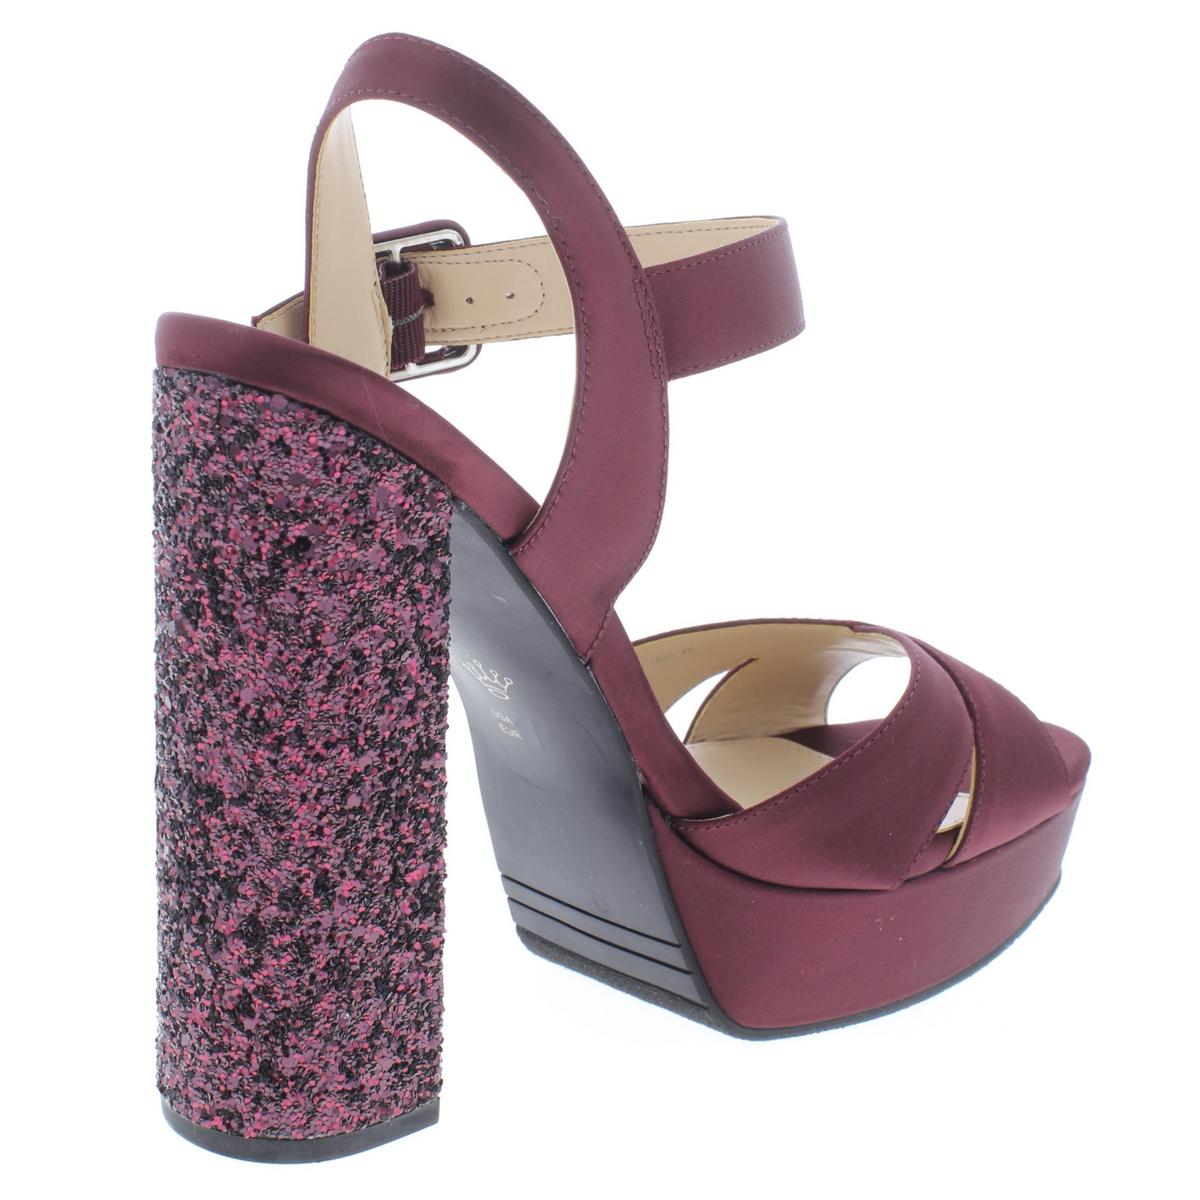 6f53214b92 Nina Womens Savita Purple Platform Sandals Shoes 8.5 Medium (b M ...